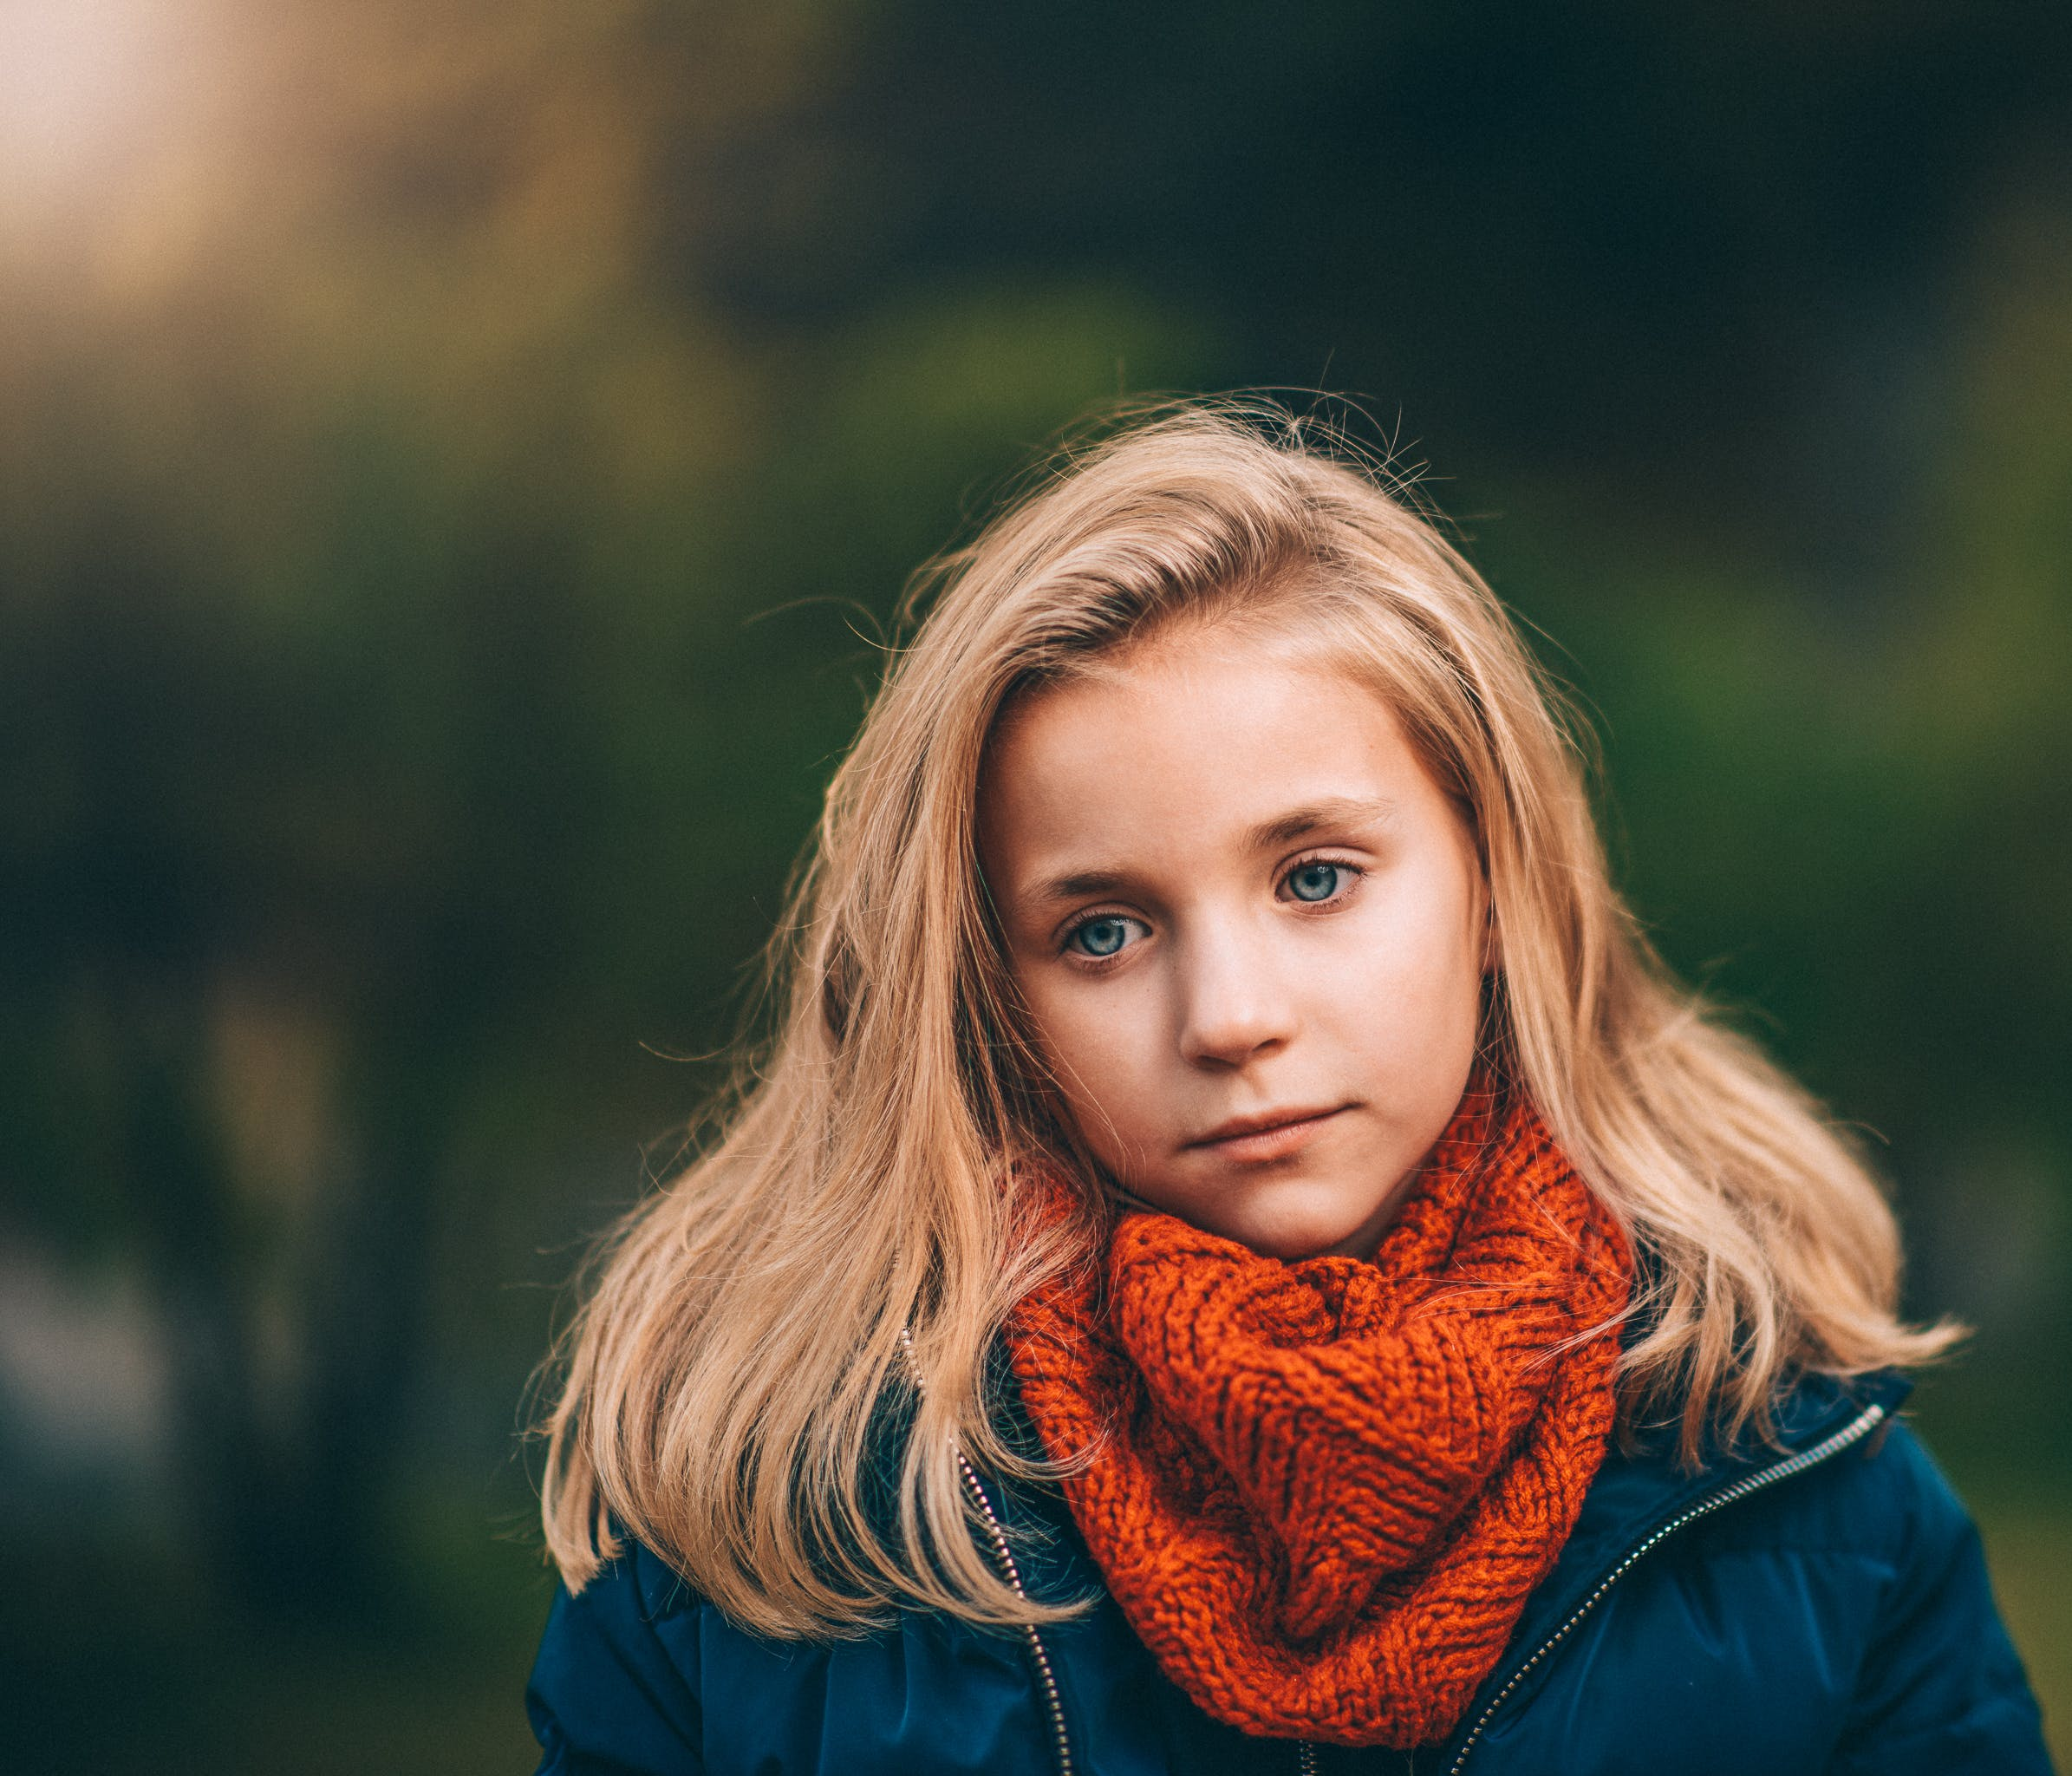 Girl Wearing Orange Scarf Selective Focus Photography